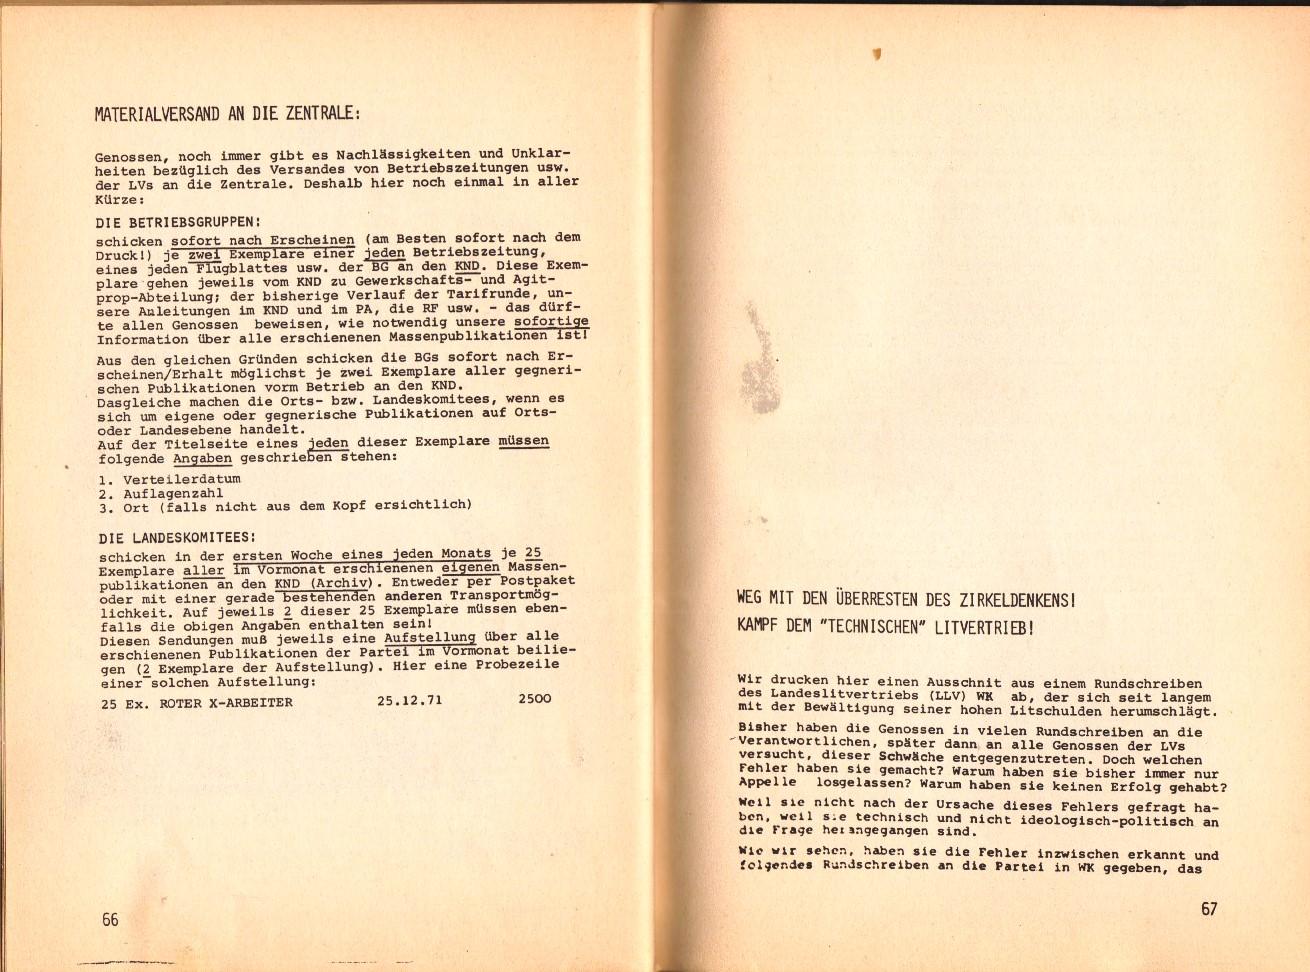 ZB_Parteiarbeiter_1971_10_35